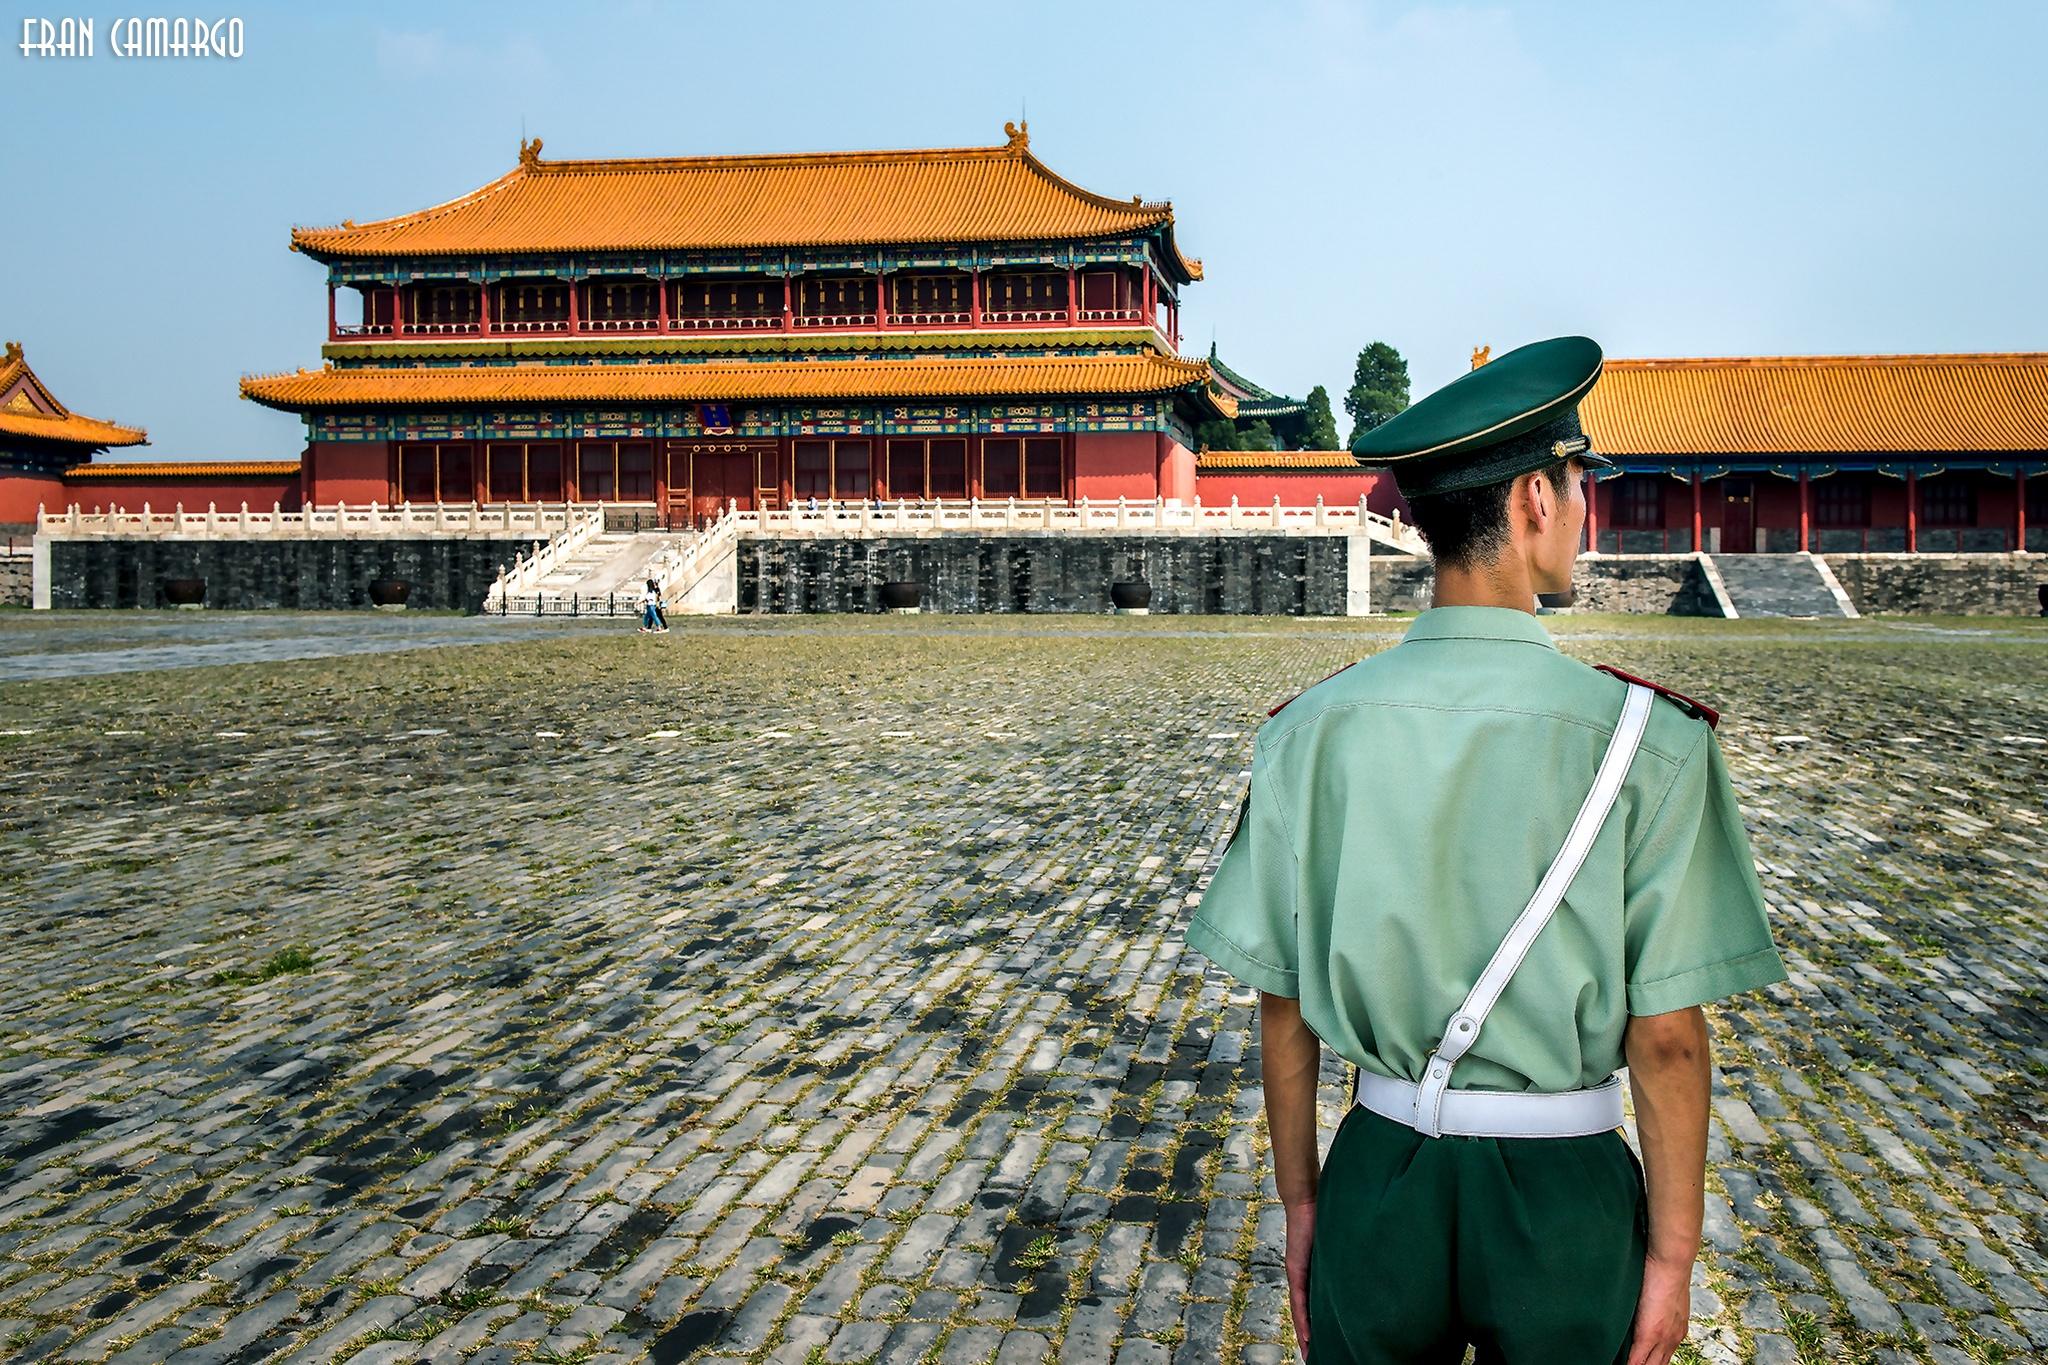 Forbidden City Beijing by Fran Camargo